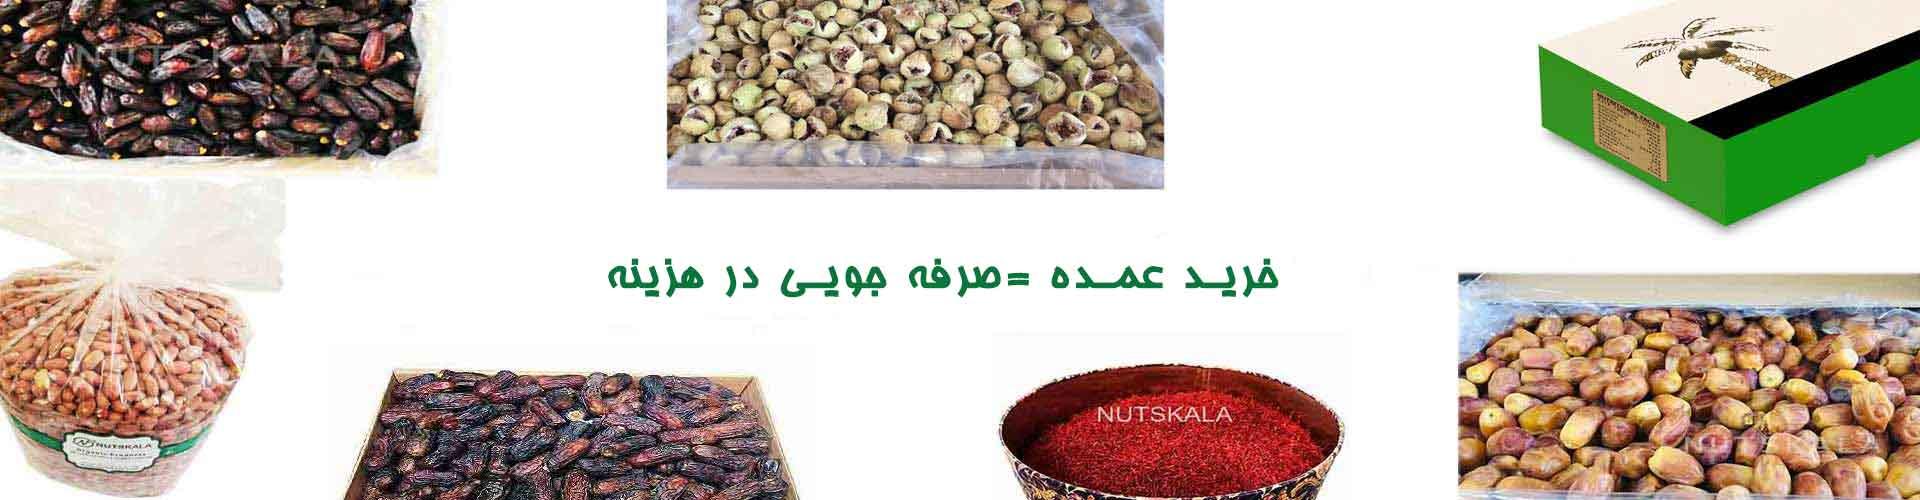 kernelo nutskala bazaar wholesale بازار عمده فروشی خشکبار میوه خشک کرنلو ناتس کالا